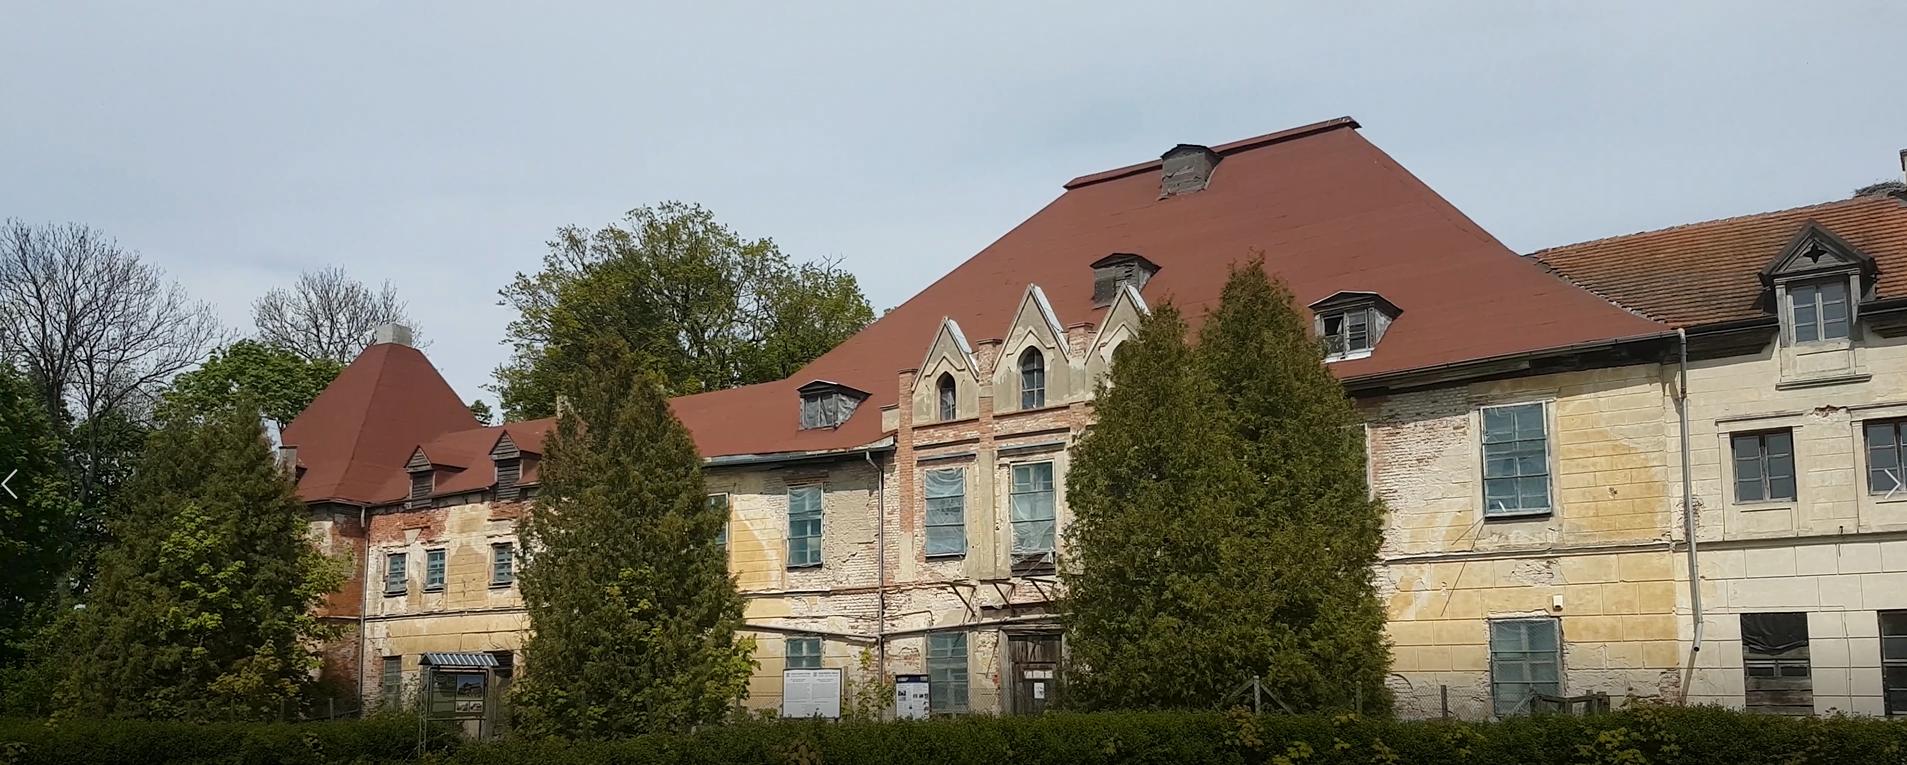 Pałac Sztynort